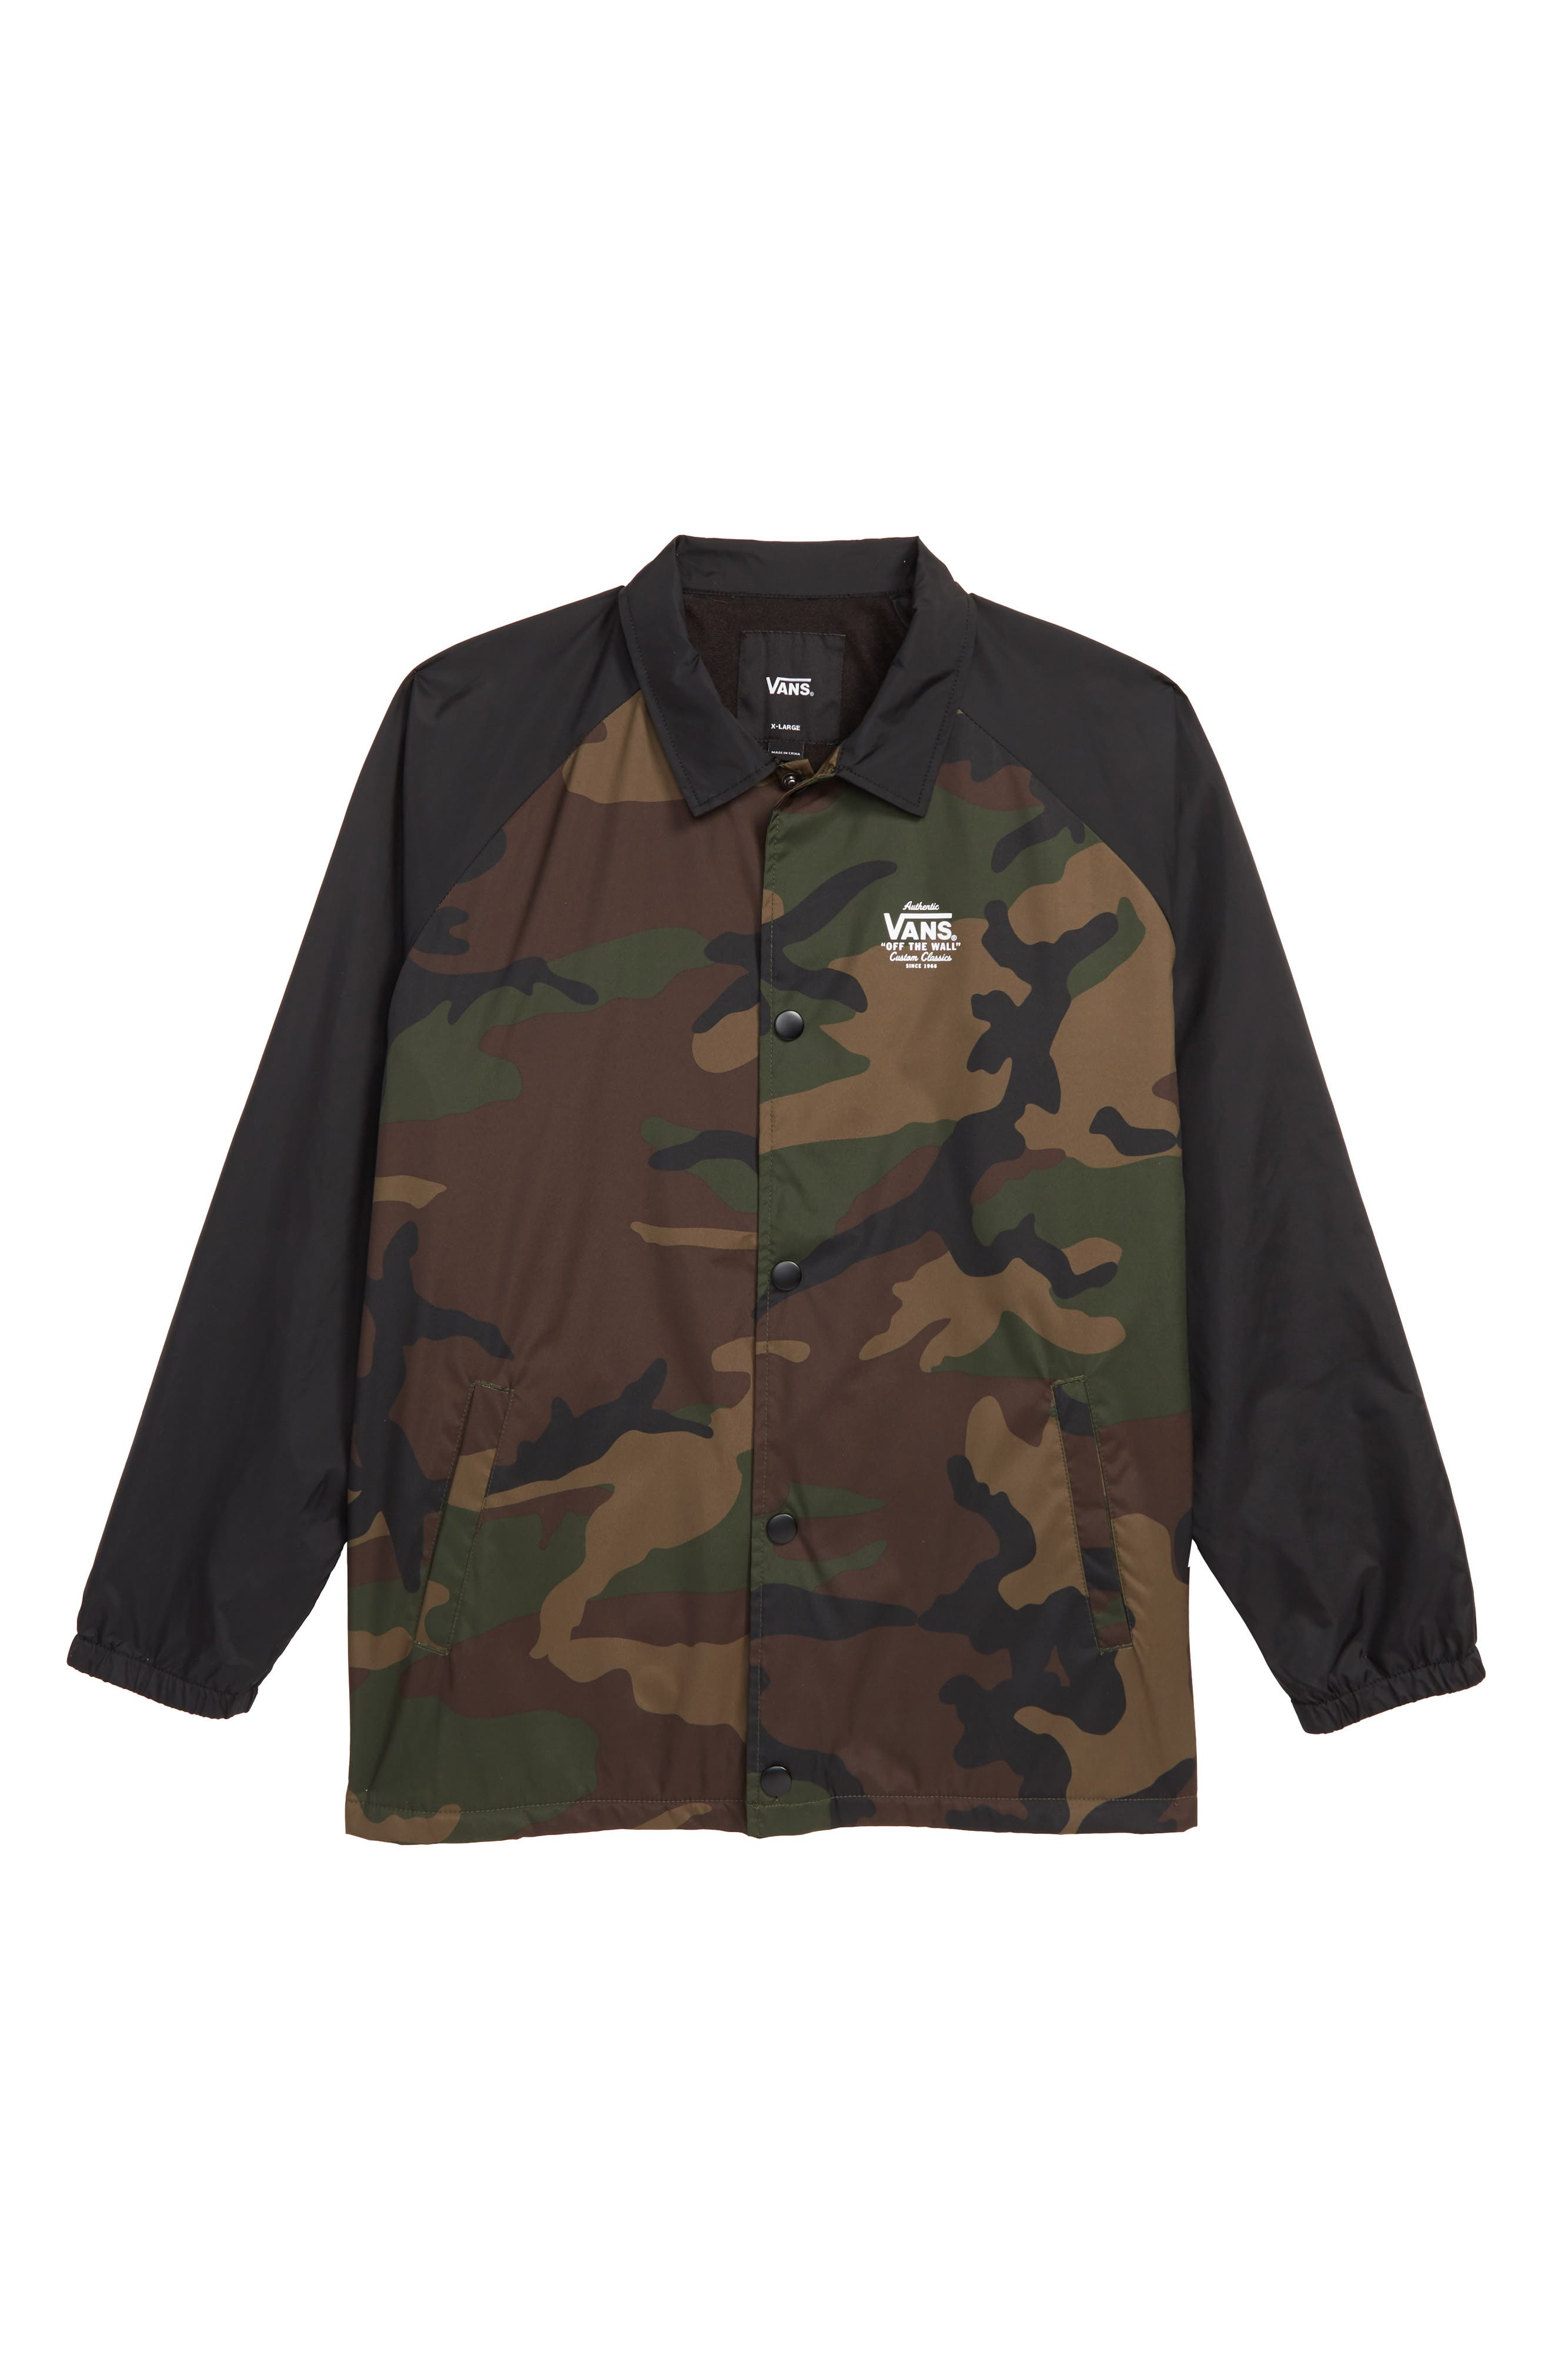 VANS,                             Torrey Water Resistant Jacket,                             Main thumbnail 1, color,                             OVERSIZED WOODLAND CAMO/ BLACK